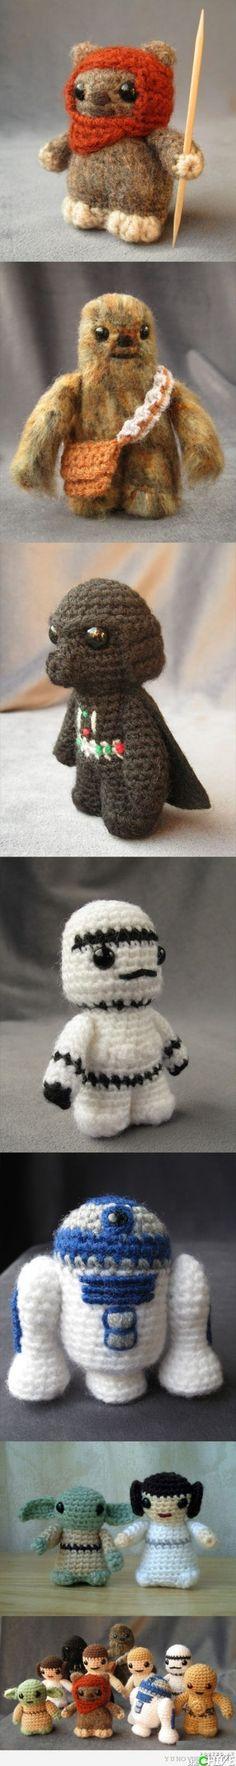 Cute Star Wars Amigurumi!